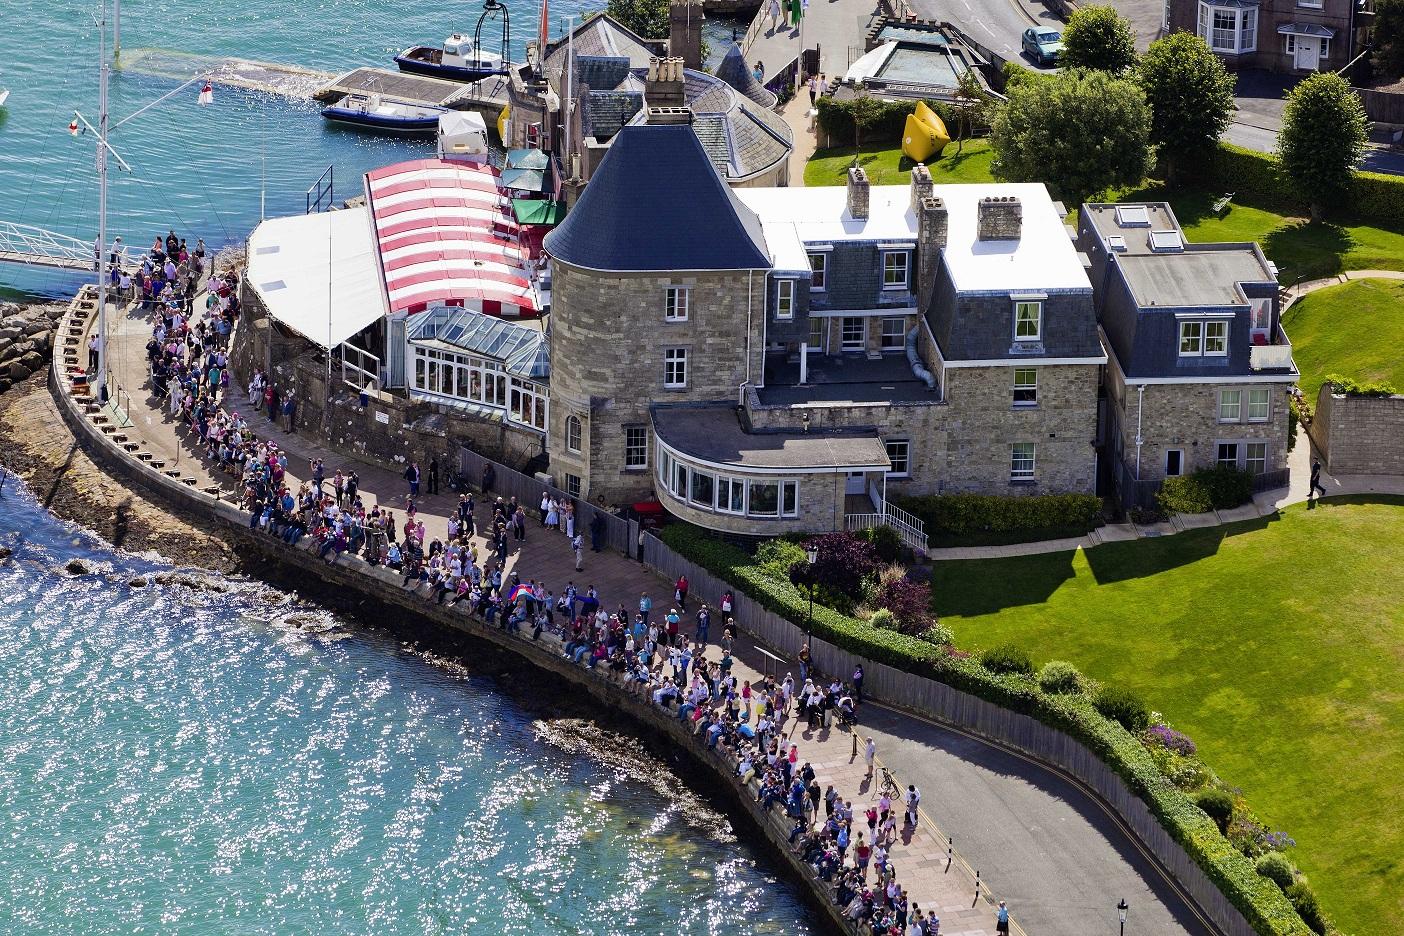 YCCS AT BICENTENARY INTERNATIONAL REGATTA IN COWES - NEWS - Yacht Club Costa Smeralda